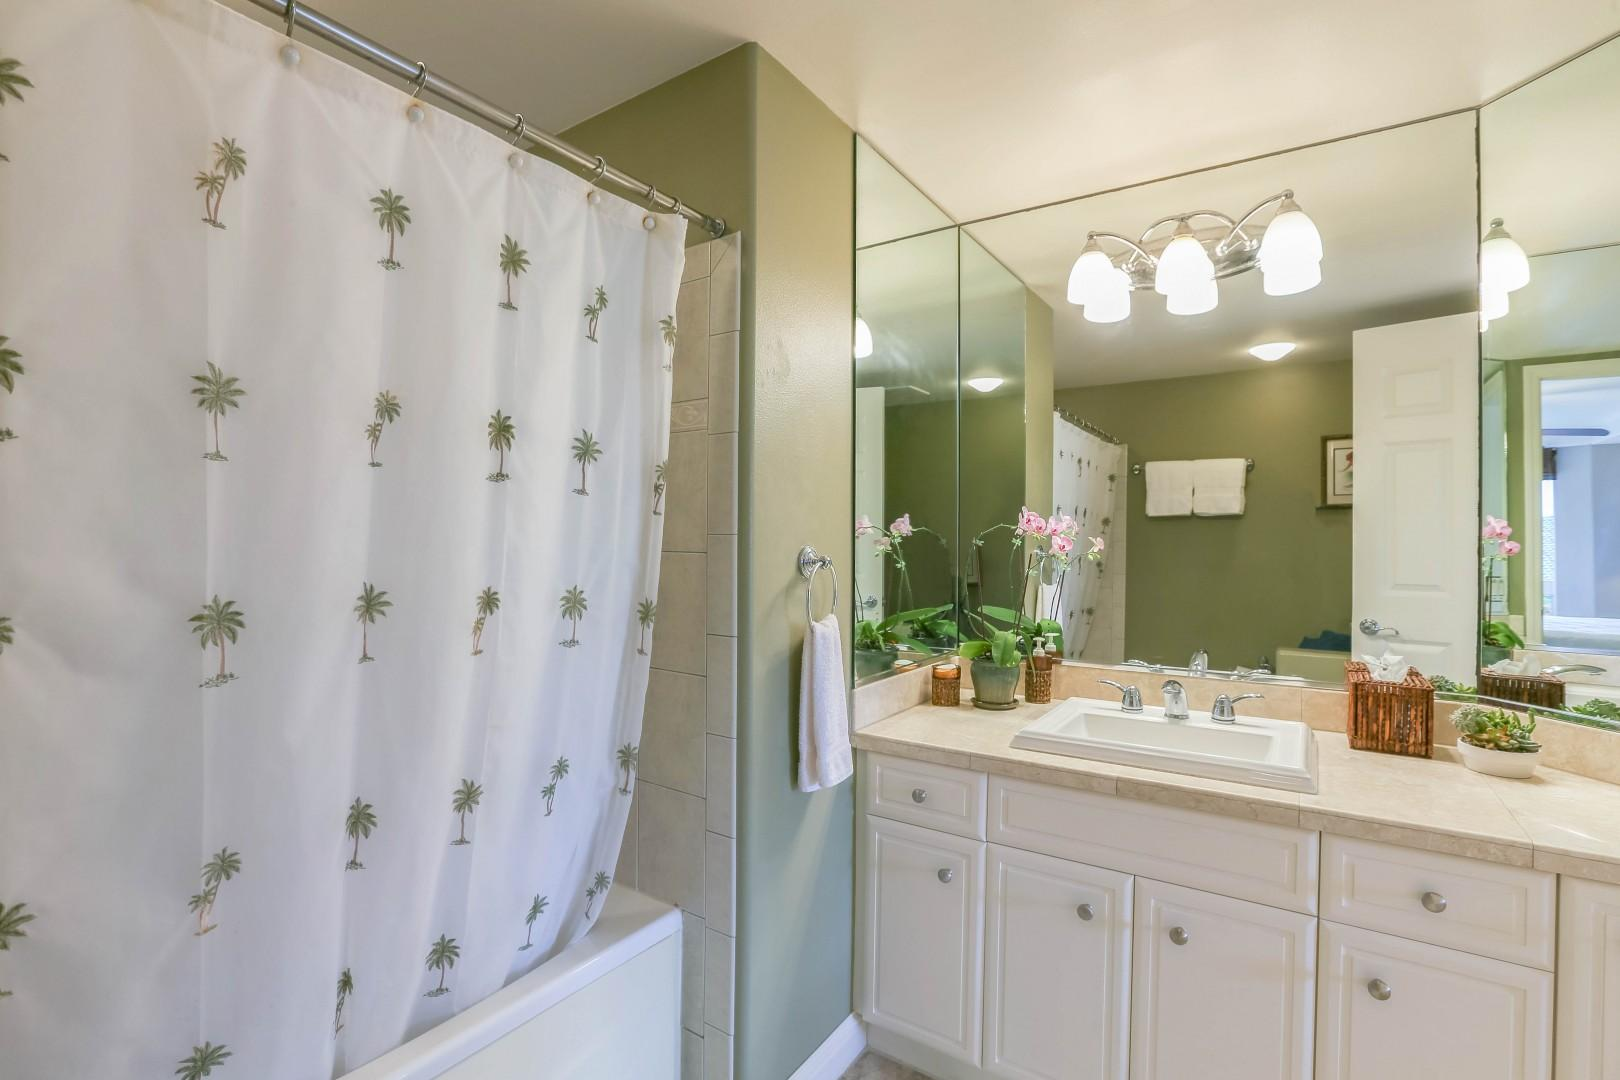 Ensuite Bathroom with Jacuzzi Tub